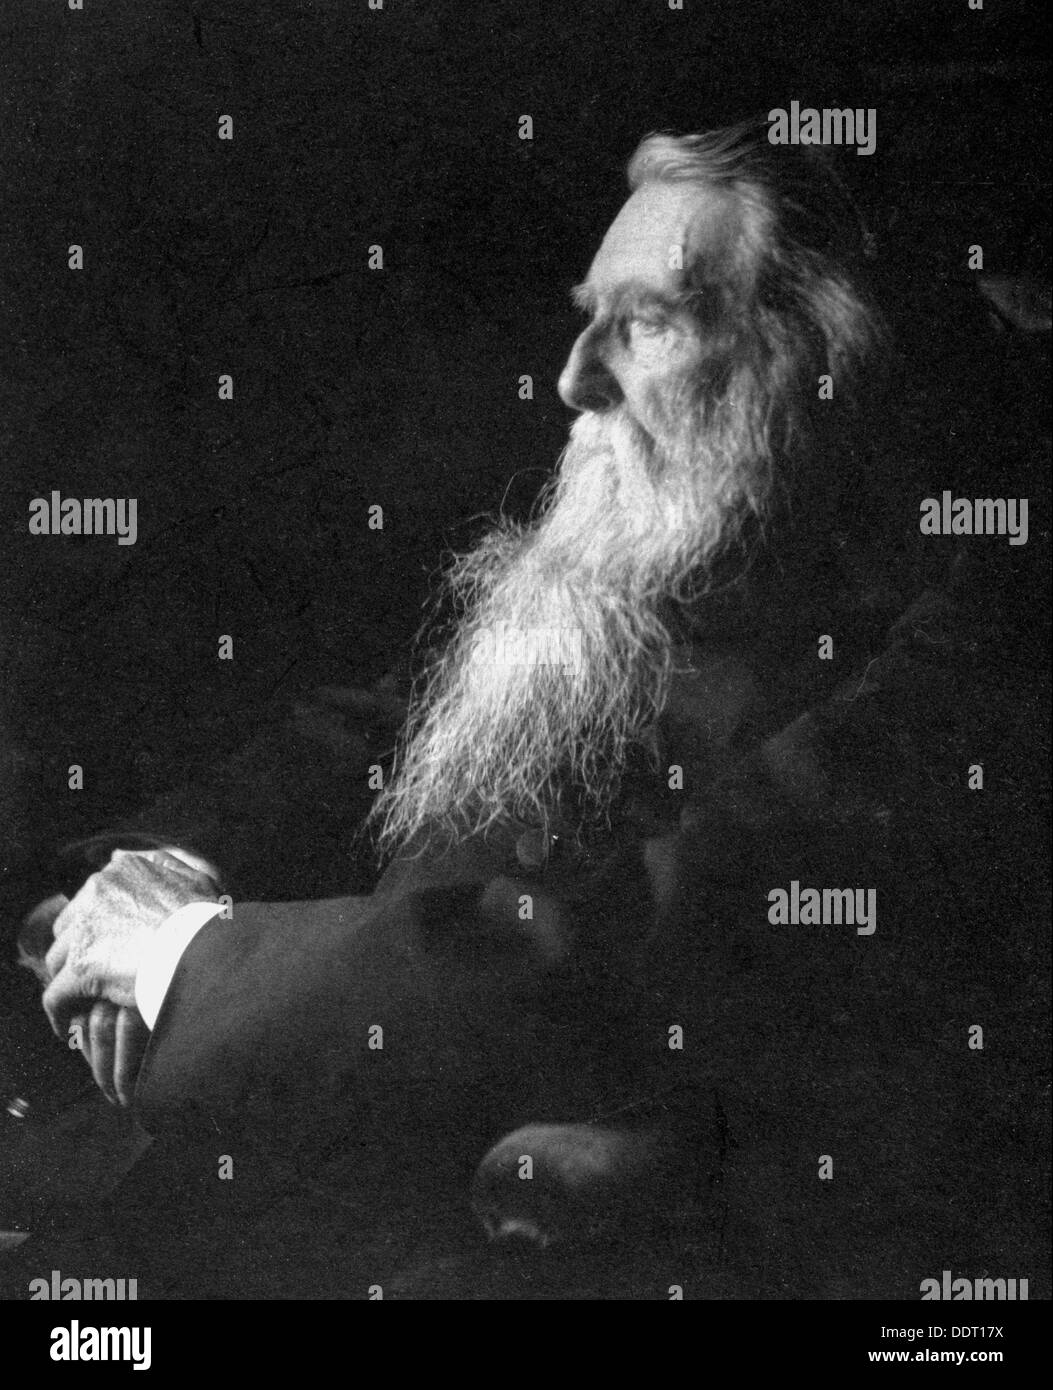 John Ruskin, artista inglês, poeta e crítico, c1897. Artista: Emil Otto Hoppe Foto de Stock